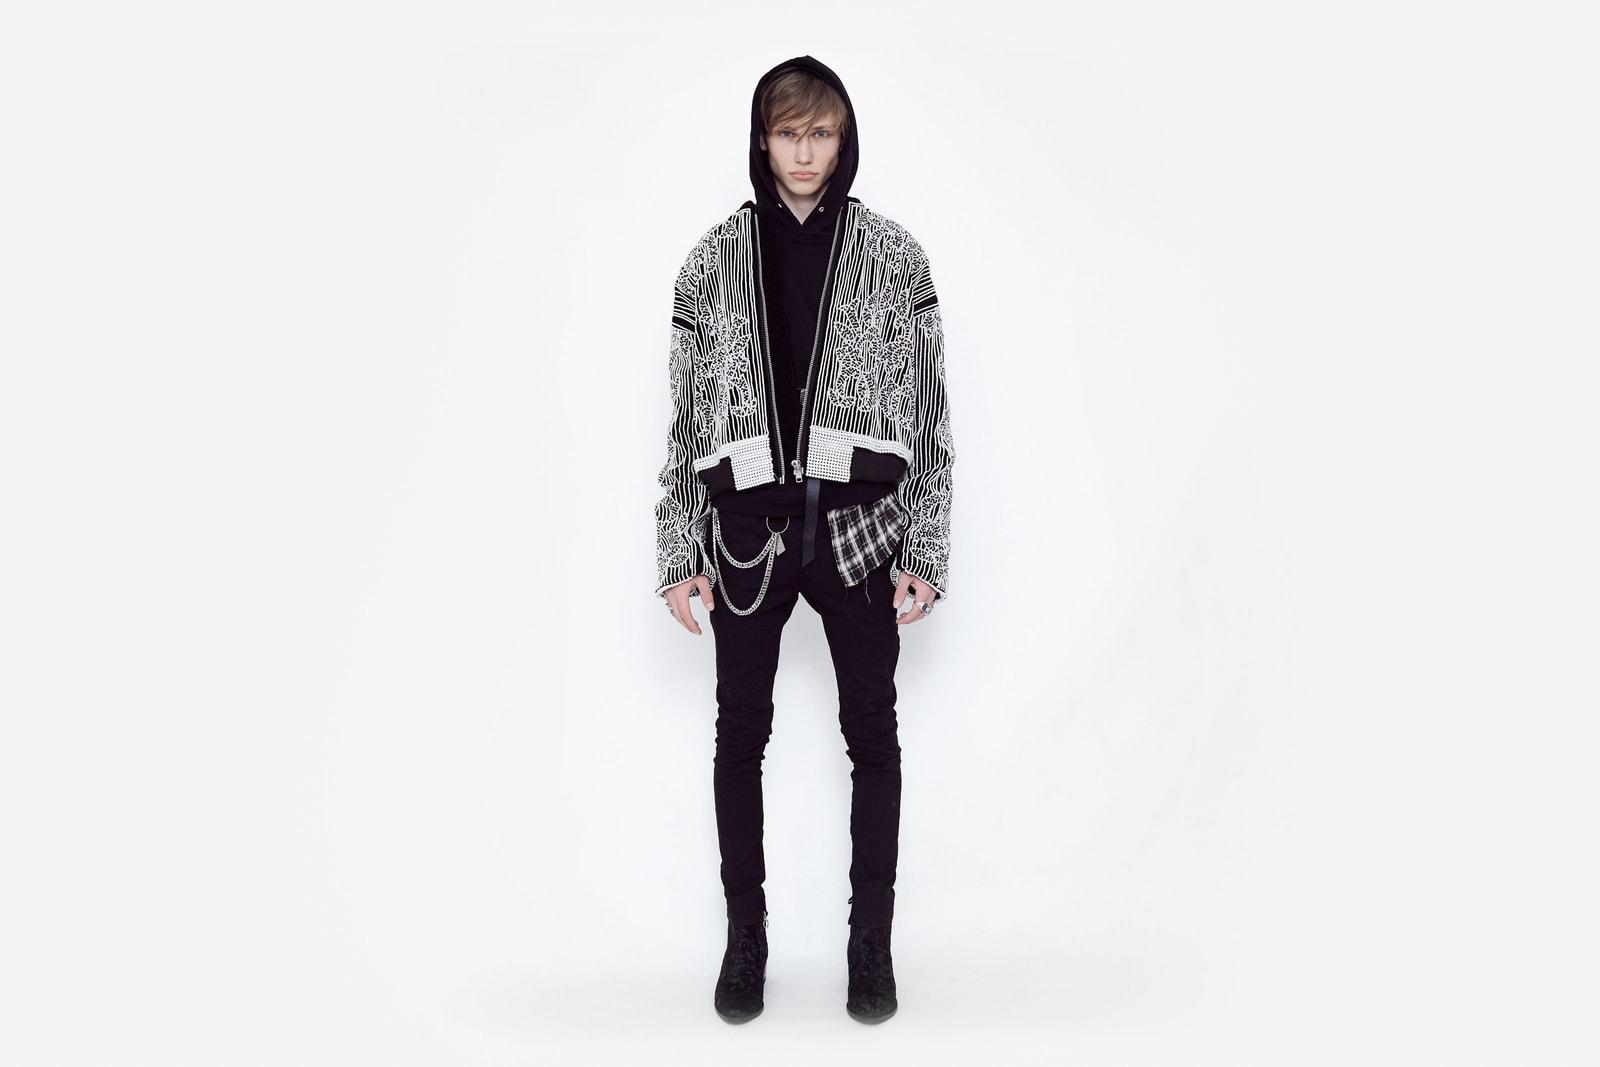 Best New Fashion Brands ALICE LAWRANCE XX Anitya CASPER AND THE BEAST GALLERY 909 HELIOT EMIL